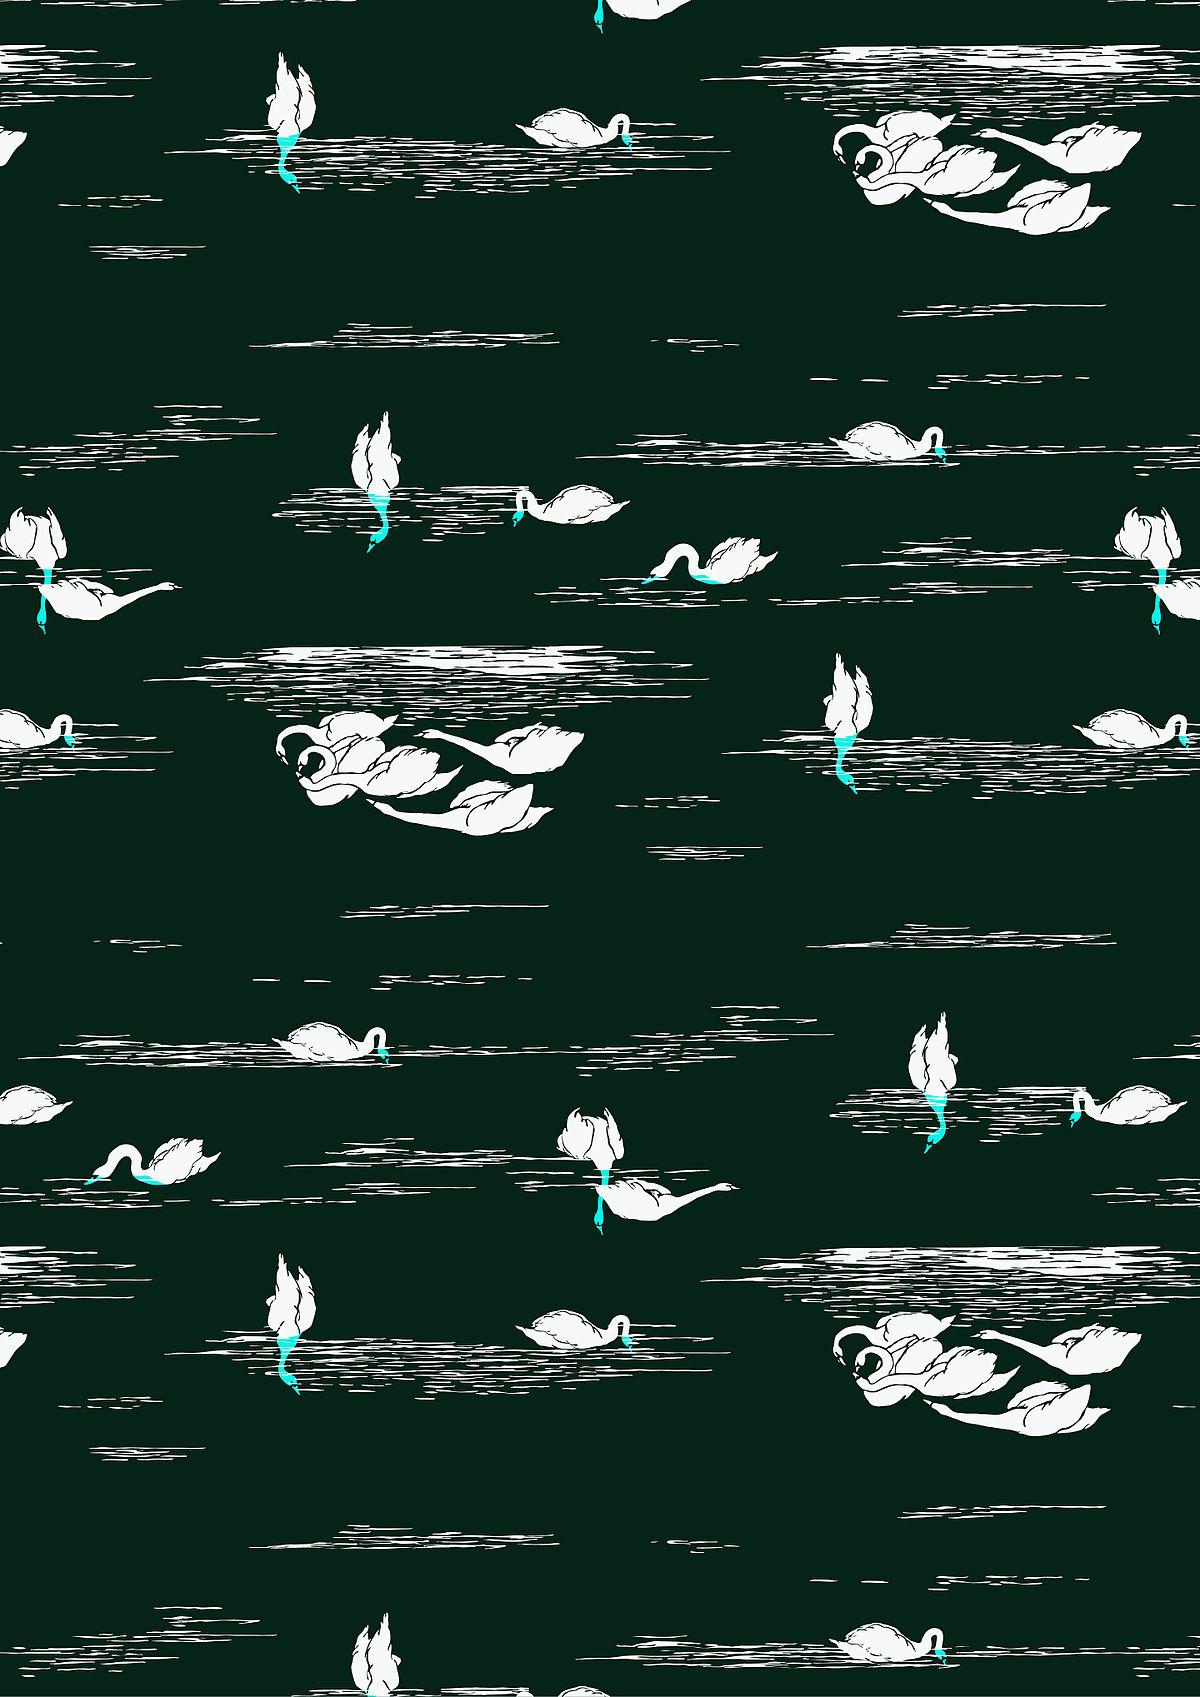 motif textile arts wikipedia